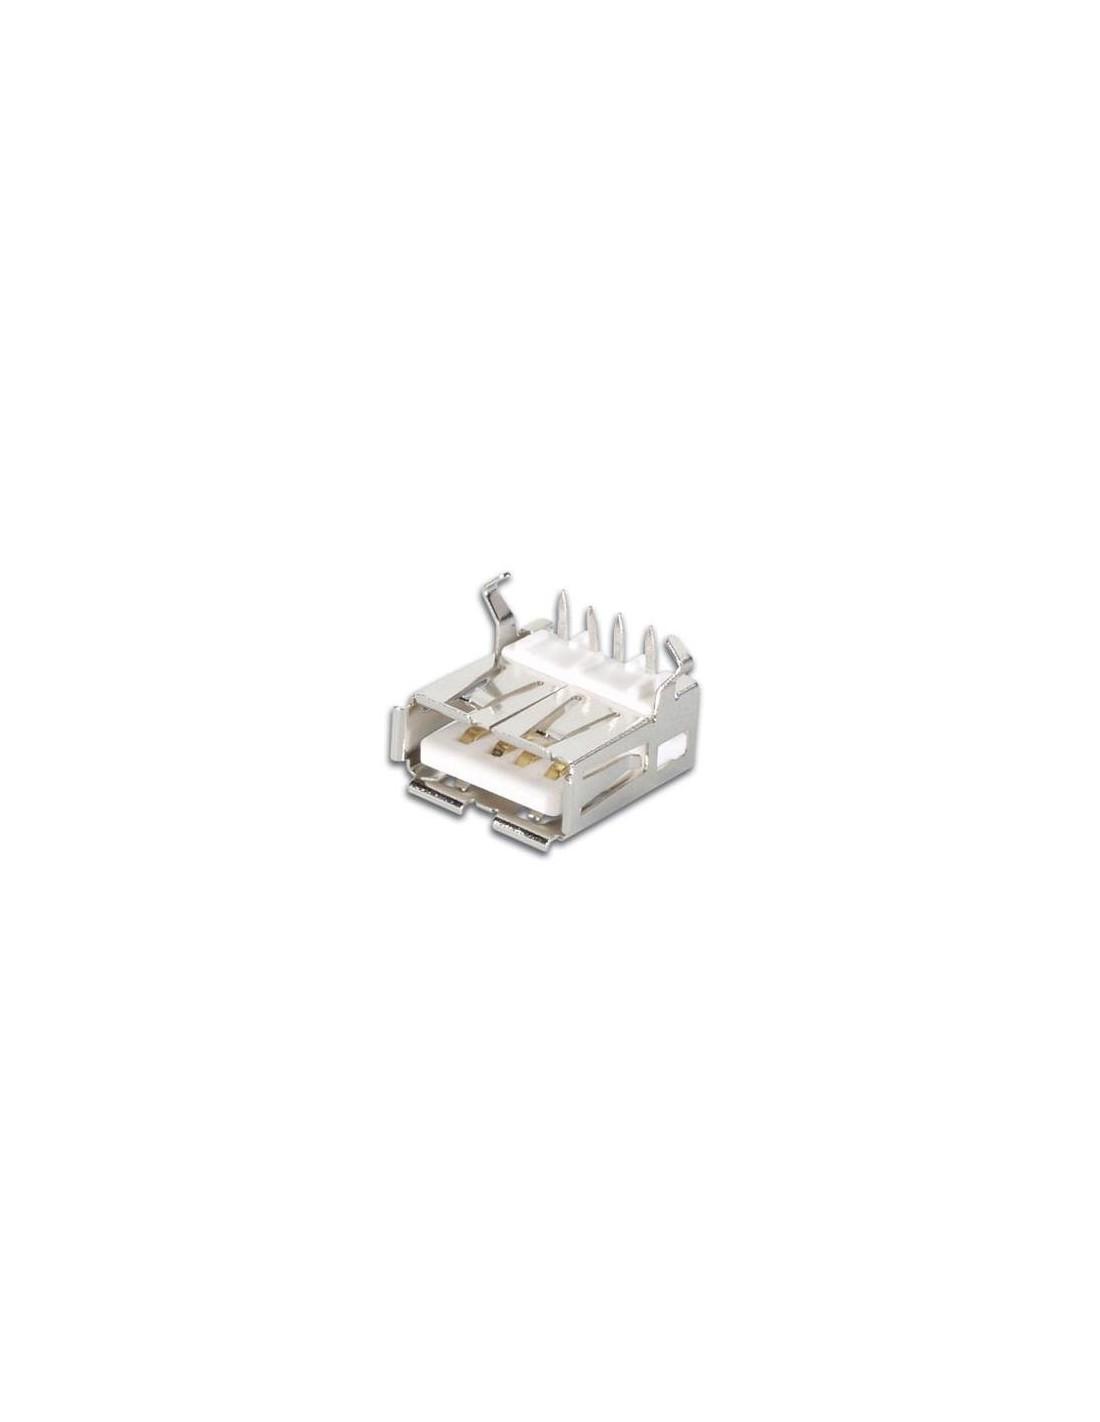 Circuito Usb : Conector usb hembra tipo a circuito impreso electrónica